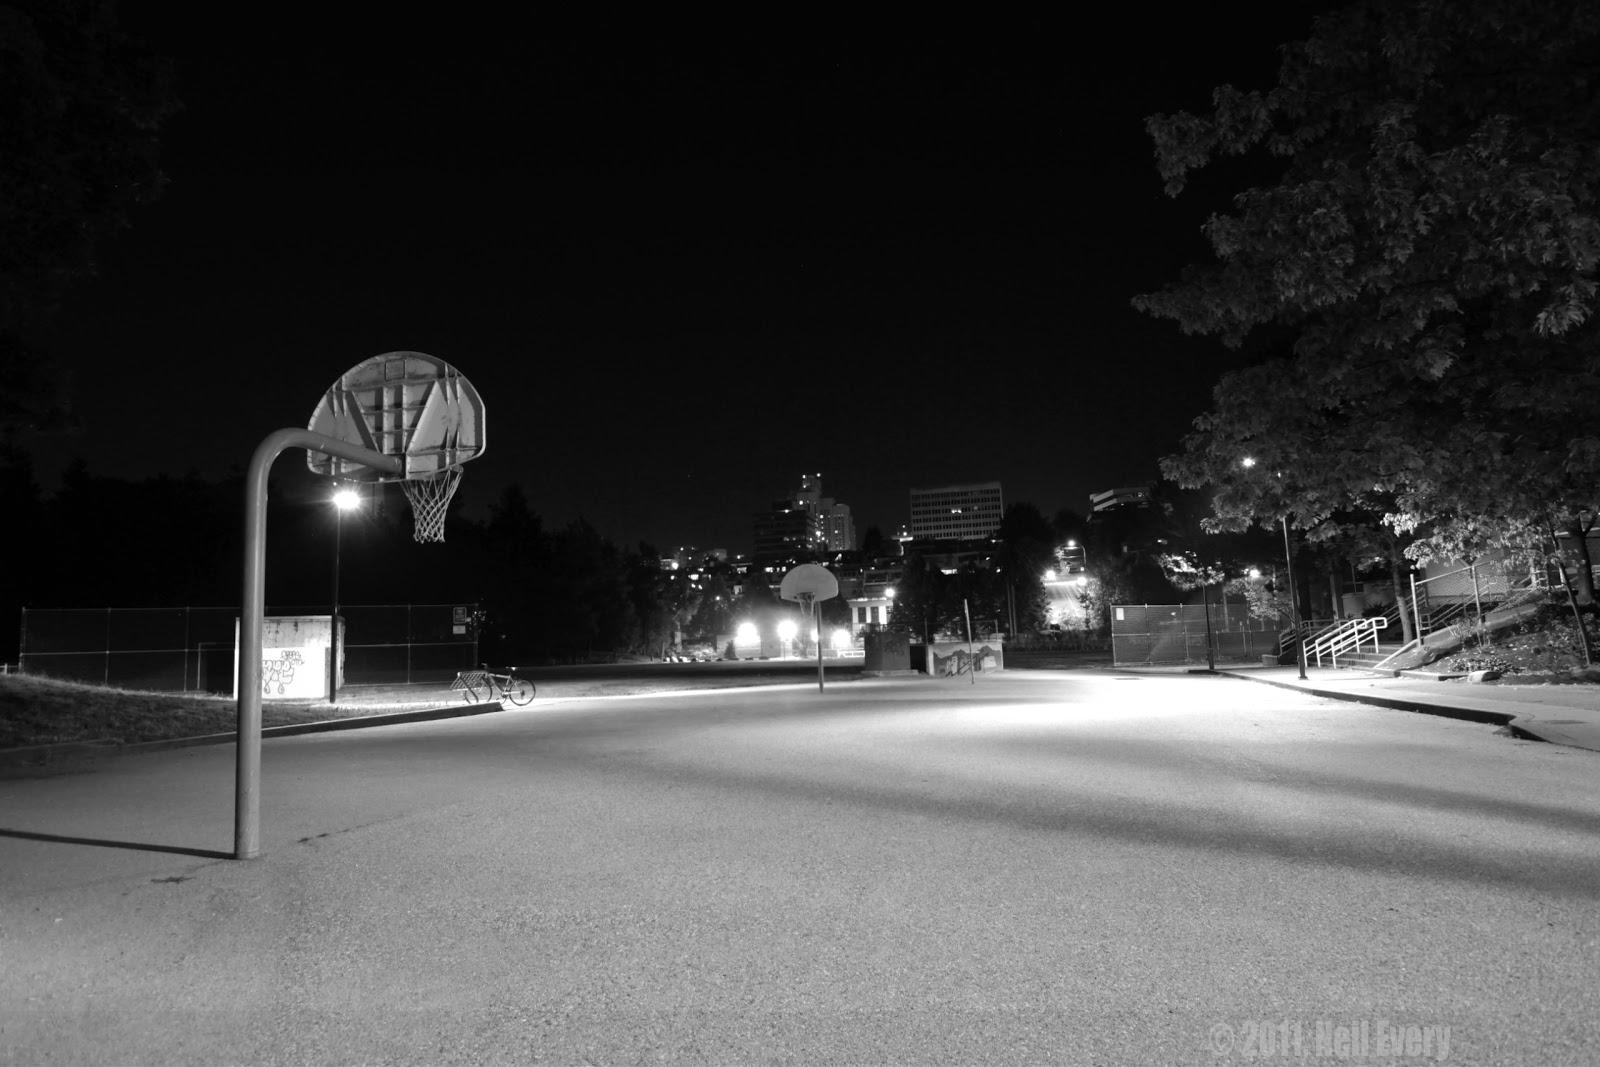 street basketball court at night wwwimgkidcom the